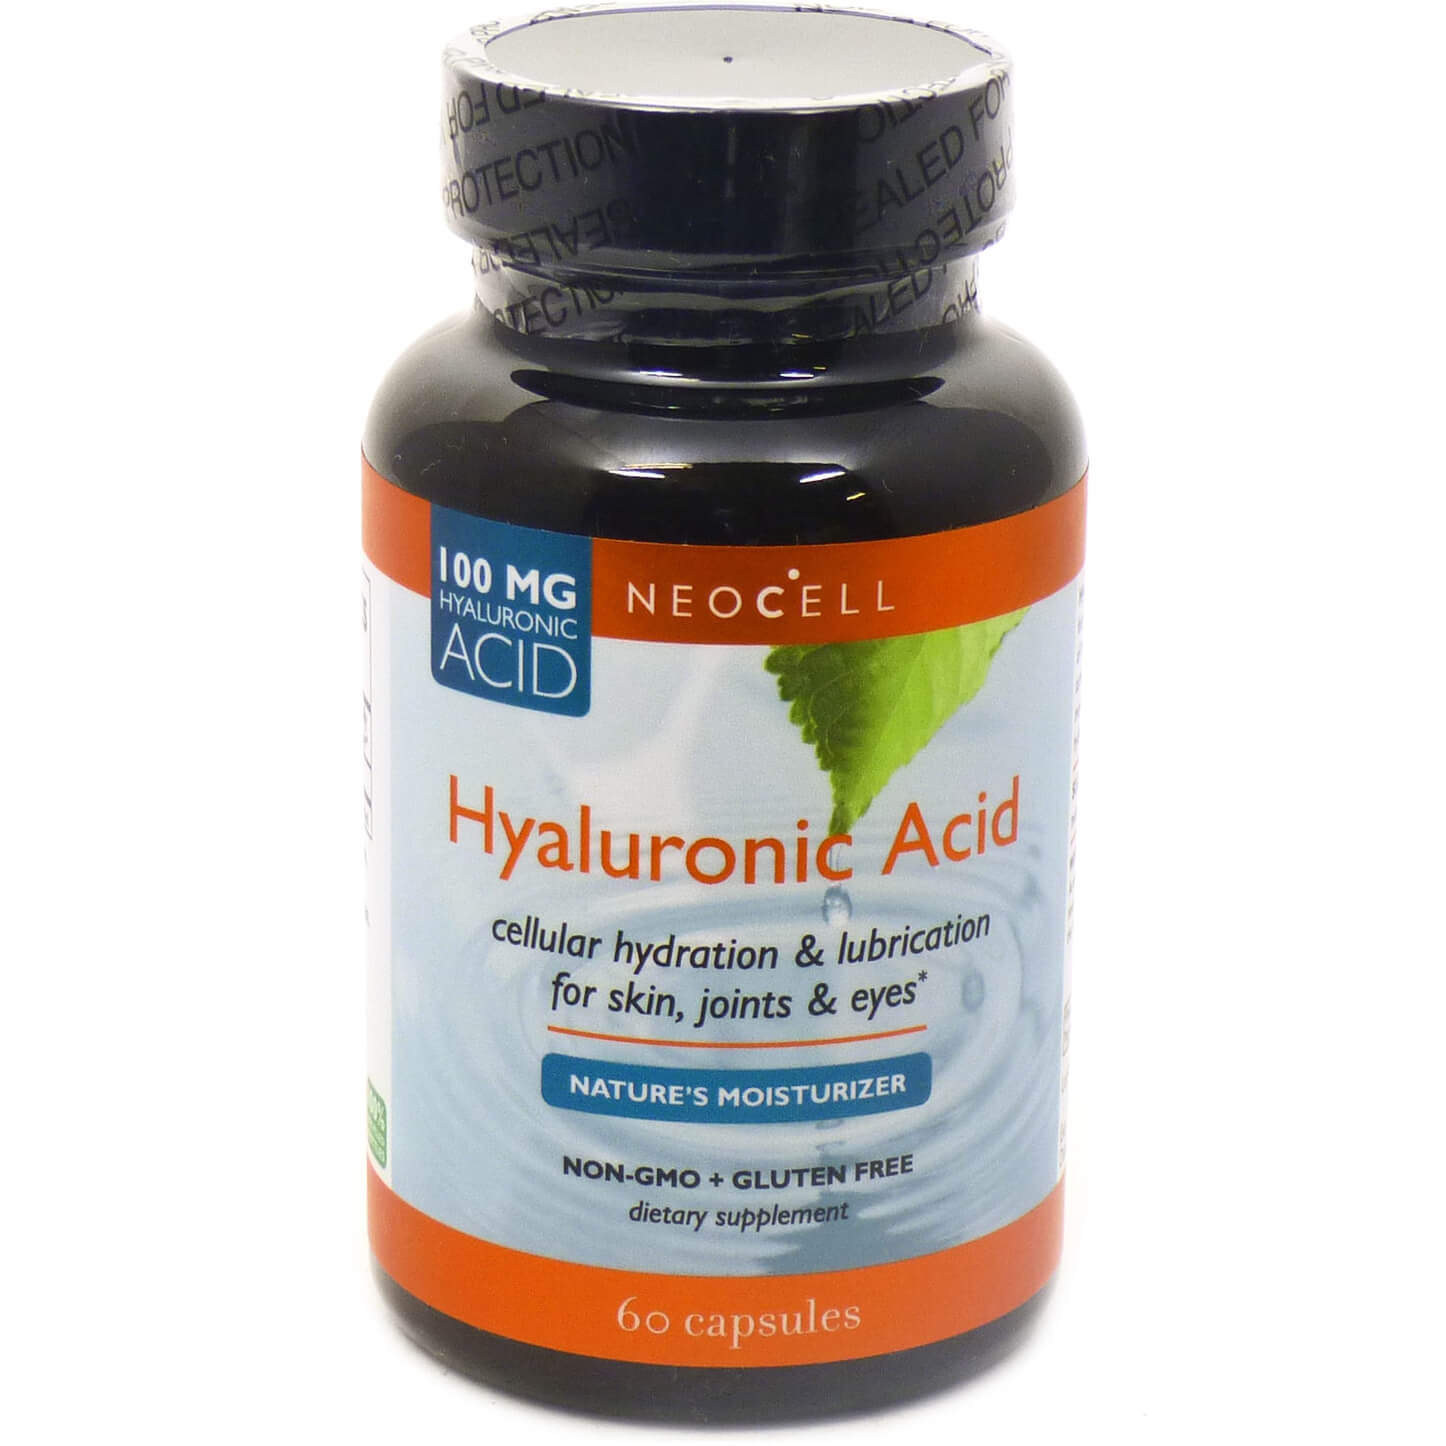 Neocell Hyaluronic Acid 100mg Υαλουρονικό Οξύ Μεγάλης Περιεκτικότητας 60 Caps